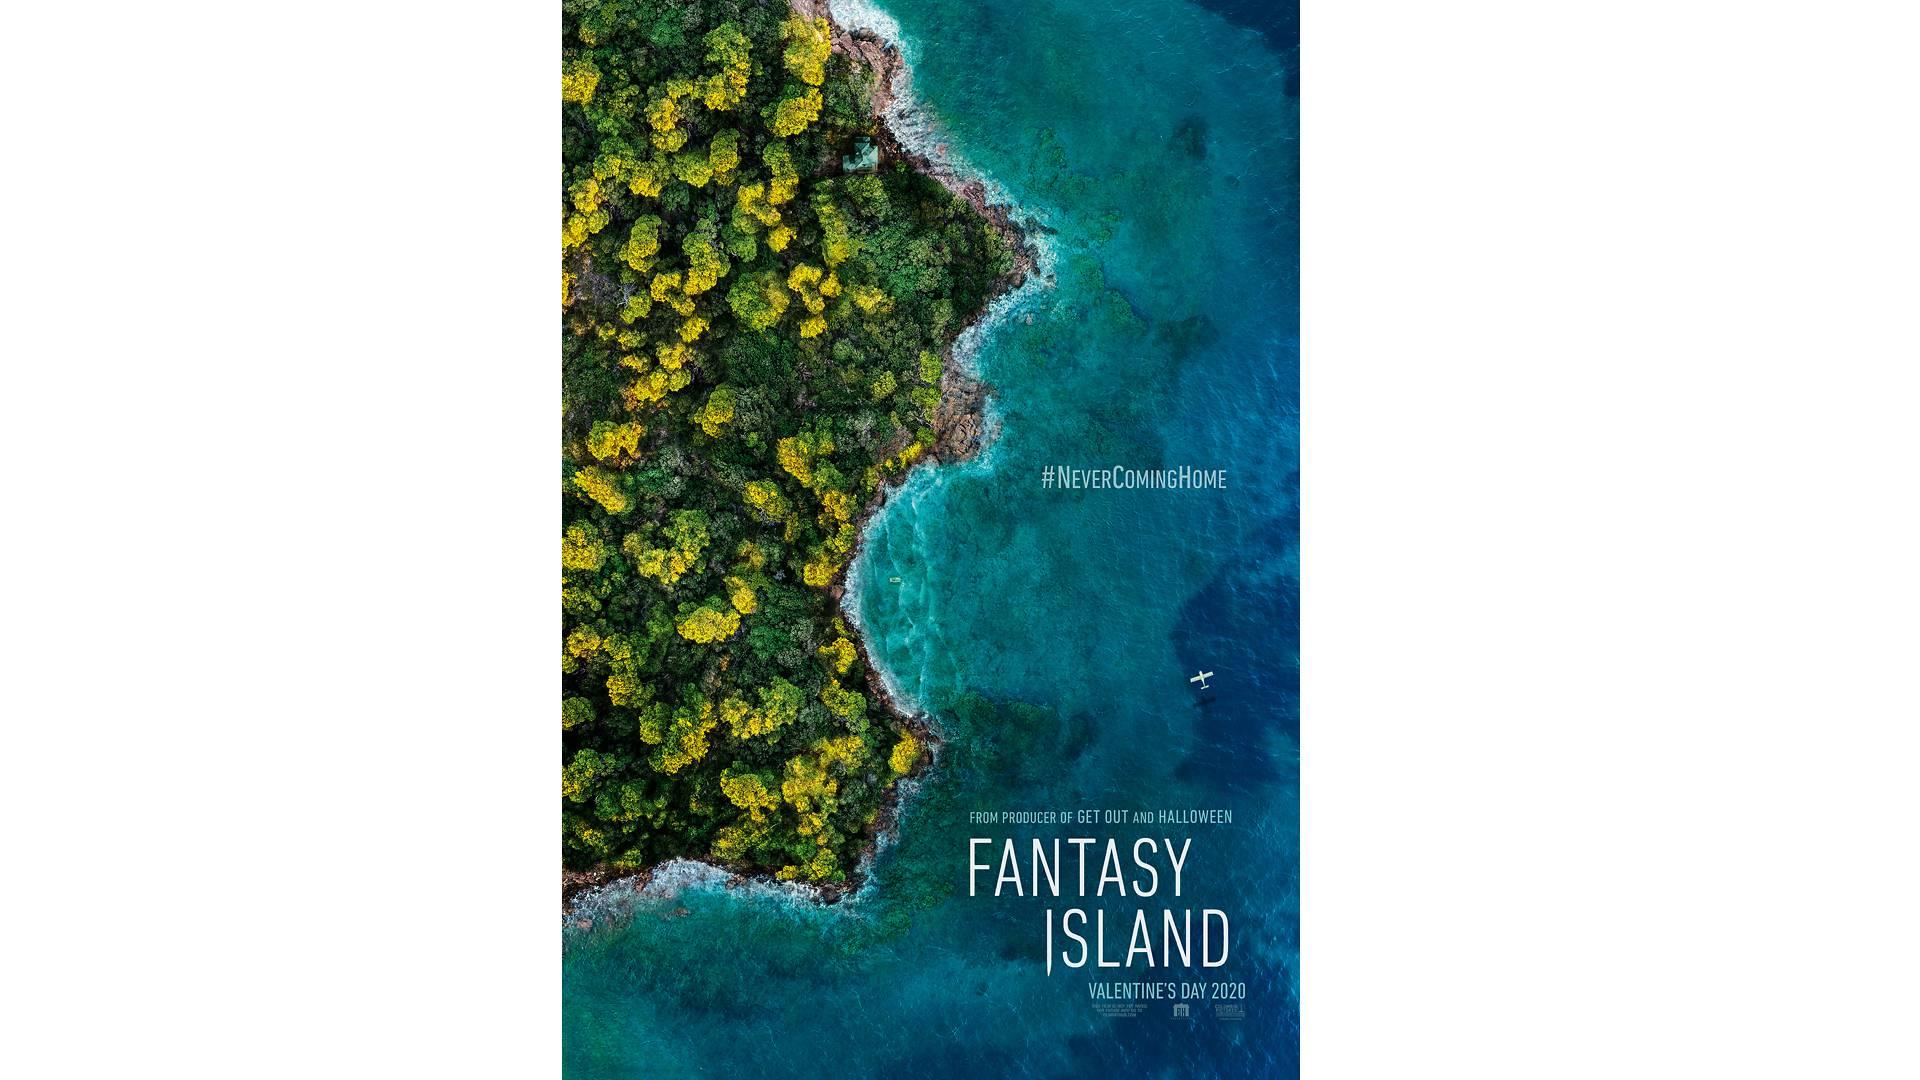 fantasy island 2020 wallpapers